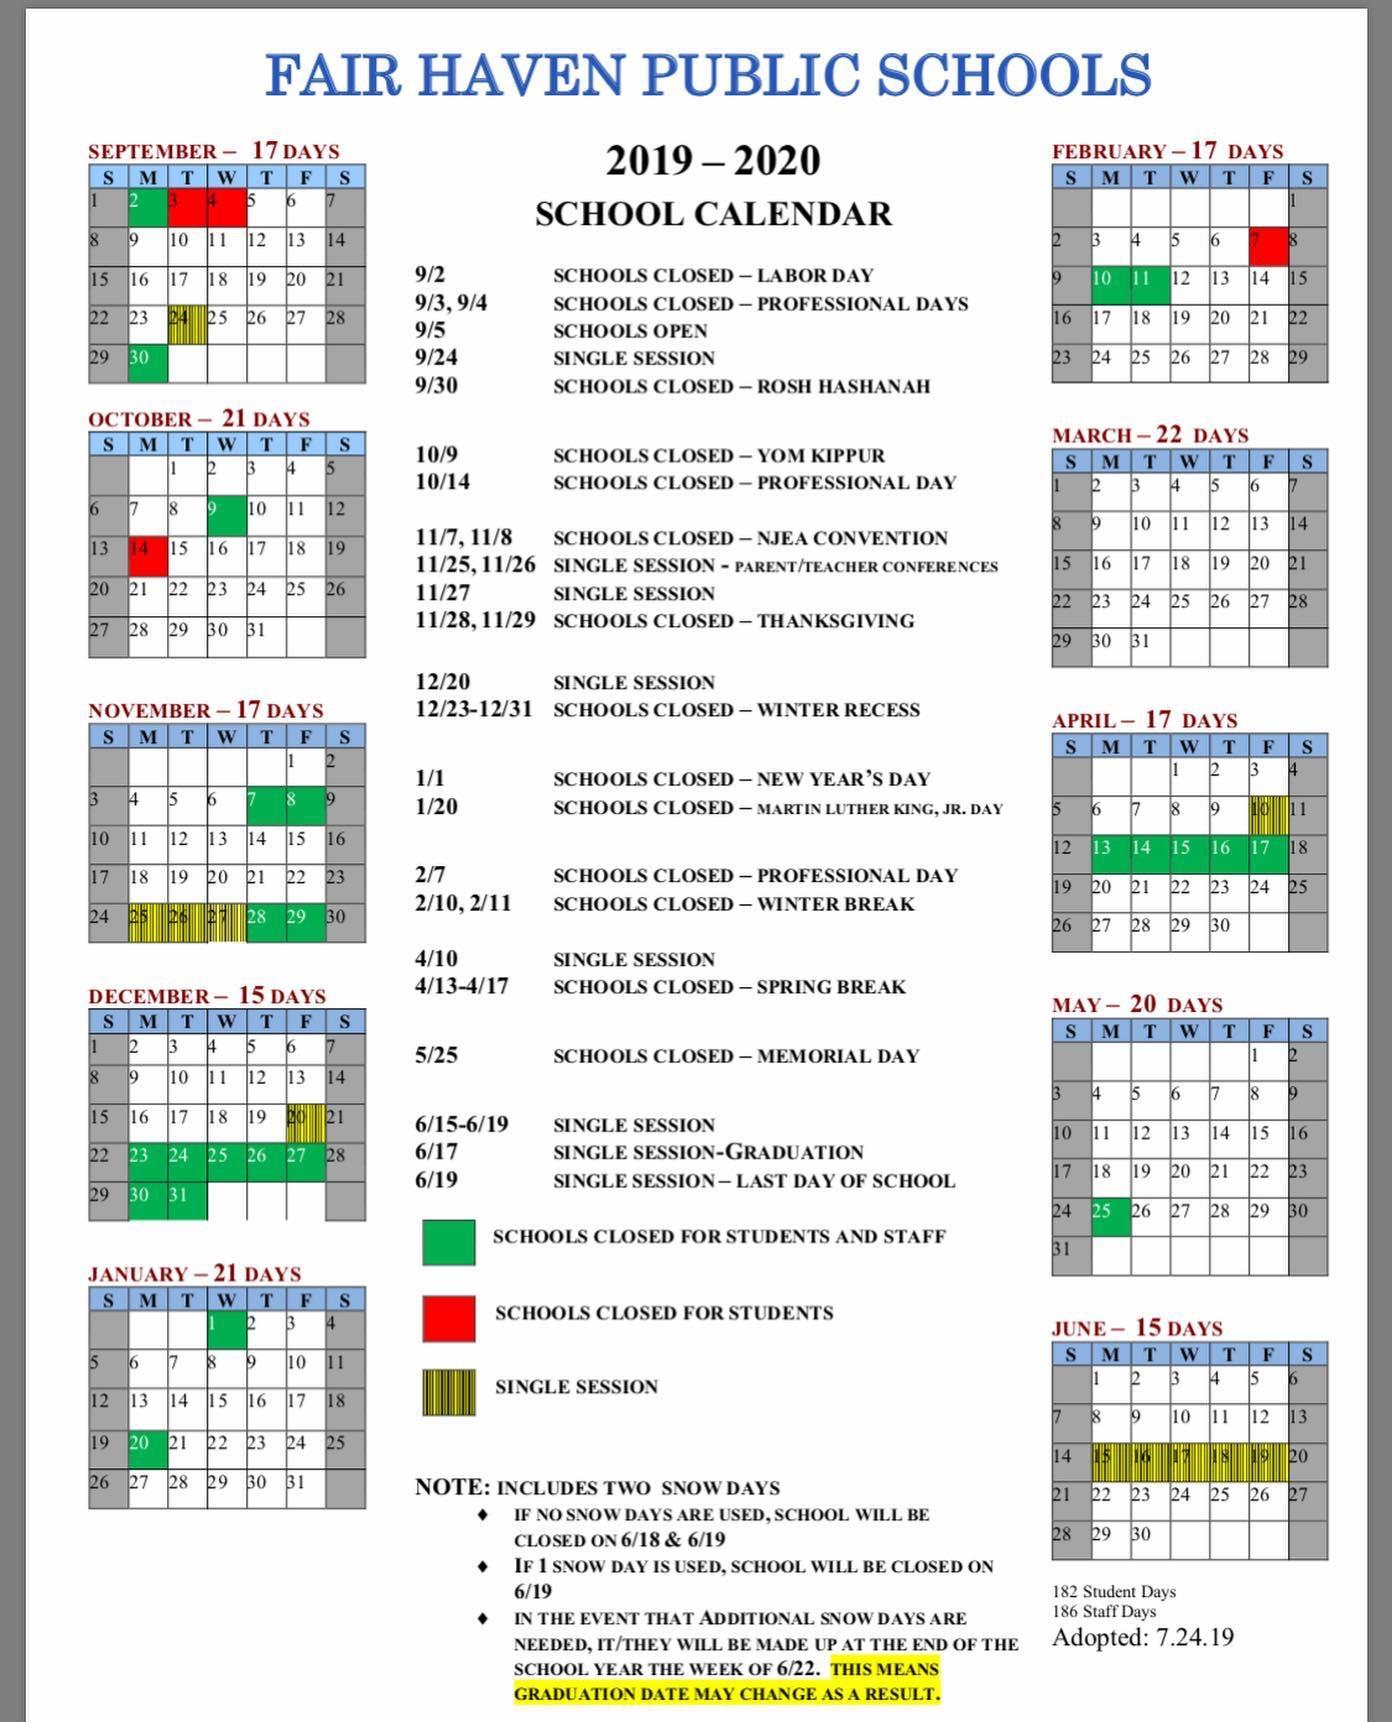 2019 2020 School Calendar Amended - Fair Haven Public Schools Pertaining To New Jersey School Public Educatiom Calendar